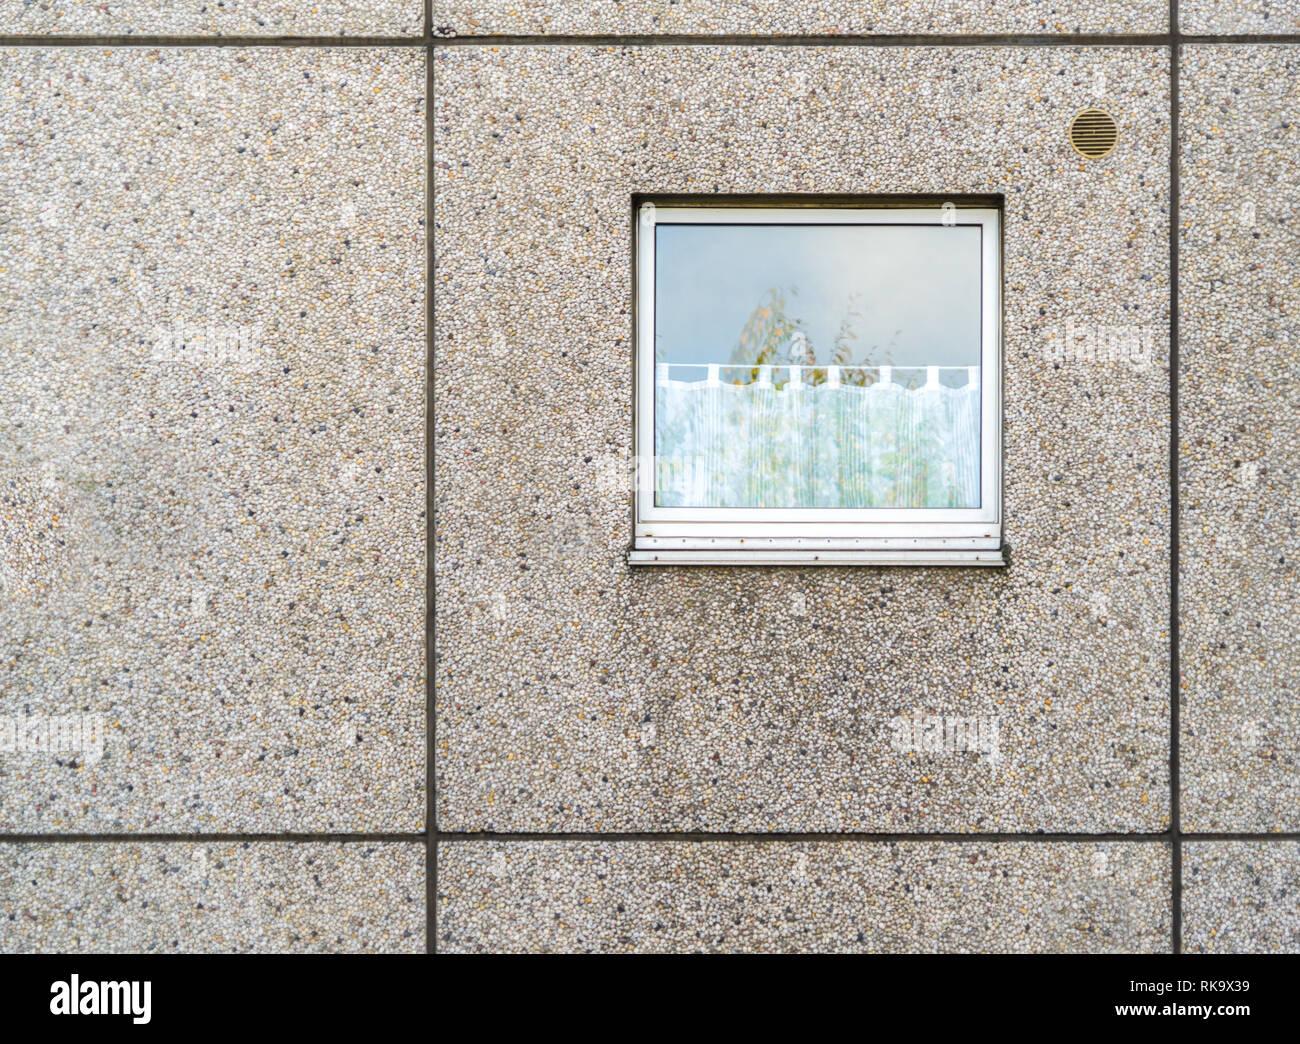 Berlin Kreuzberg Architektur - Stock Image